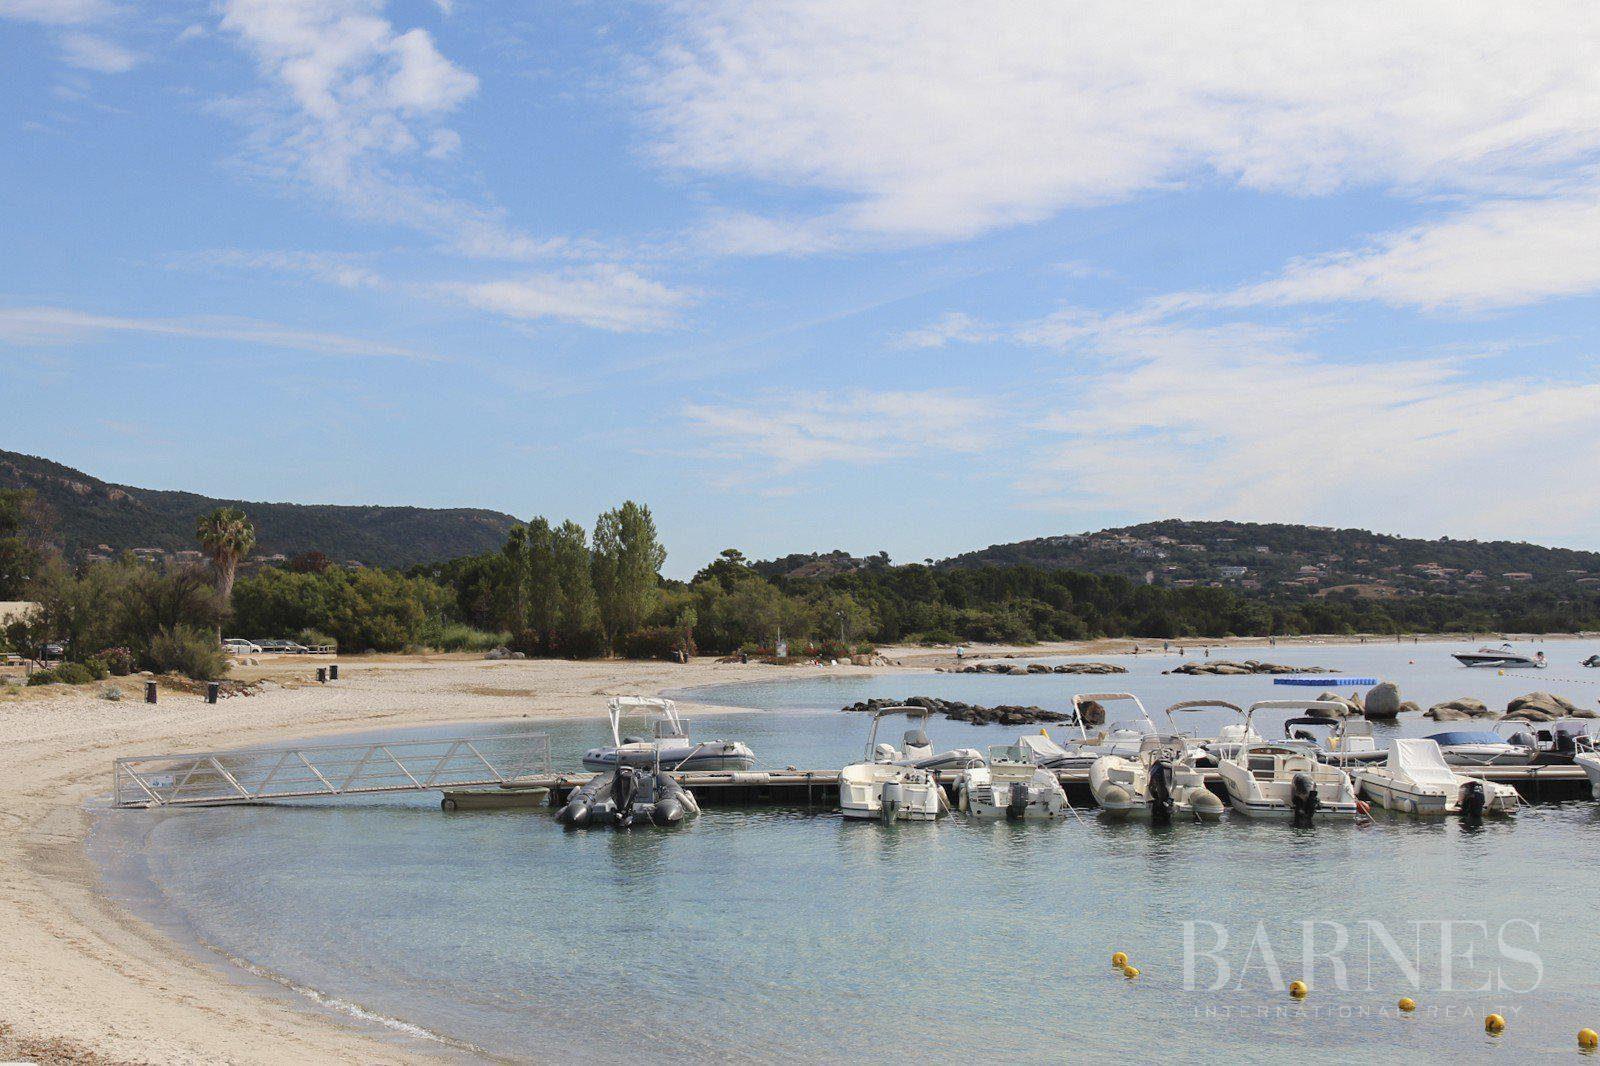 Location de villas de luxe en bord de mer à Saint Cyprien